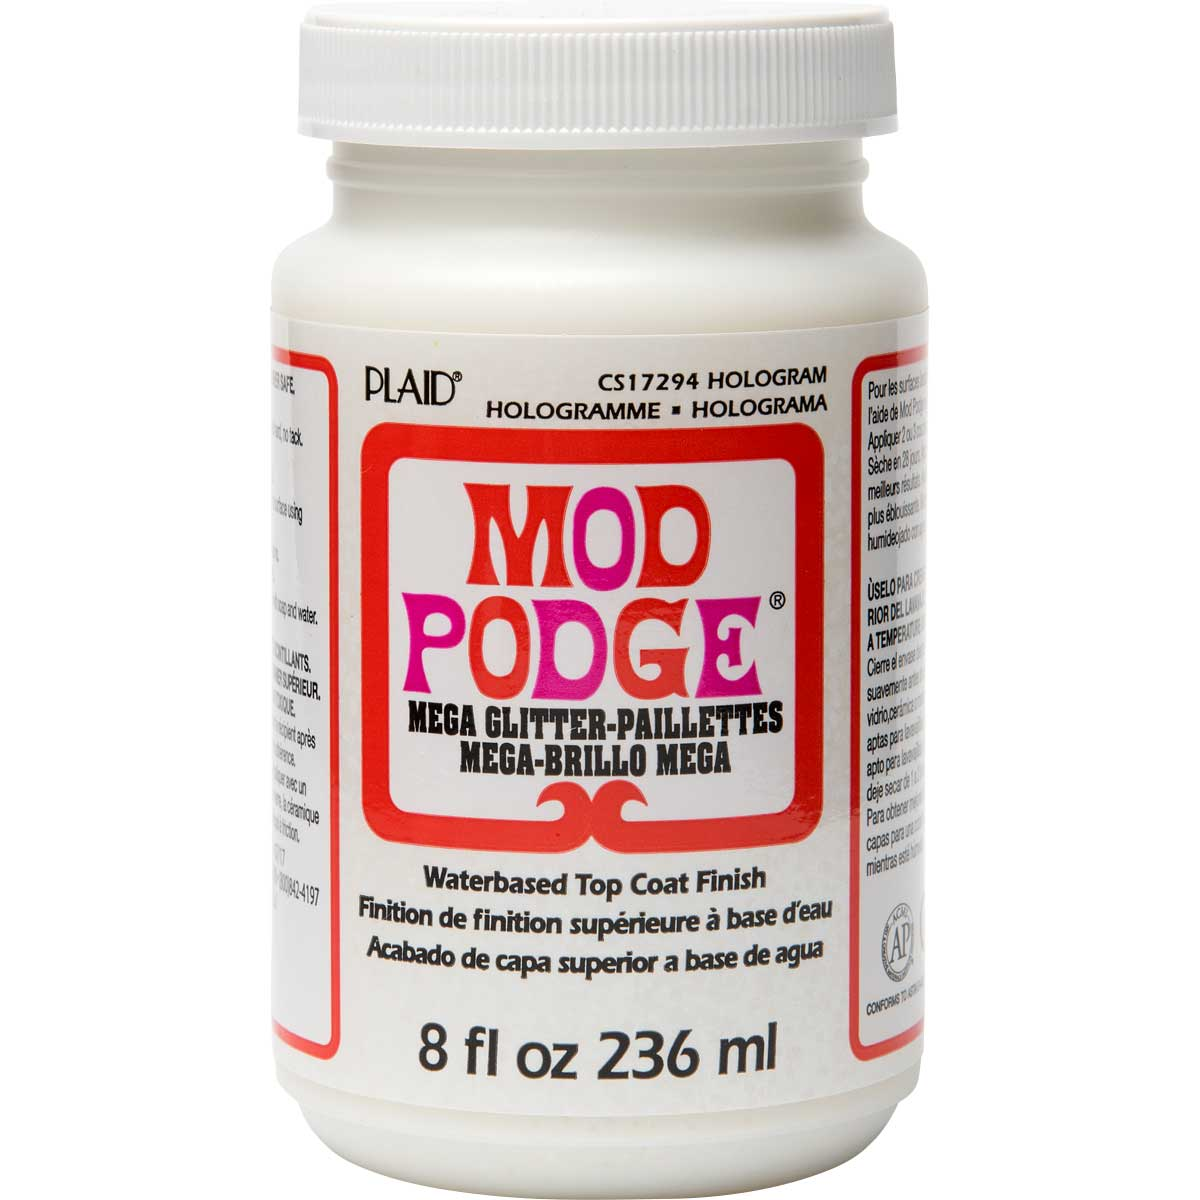 Mod Podge ® Mega Glitter - Hologram, 8 oz.